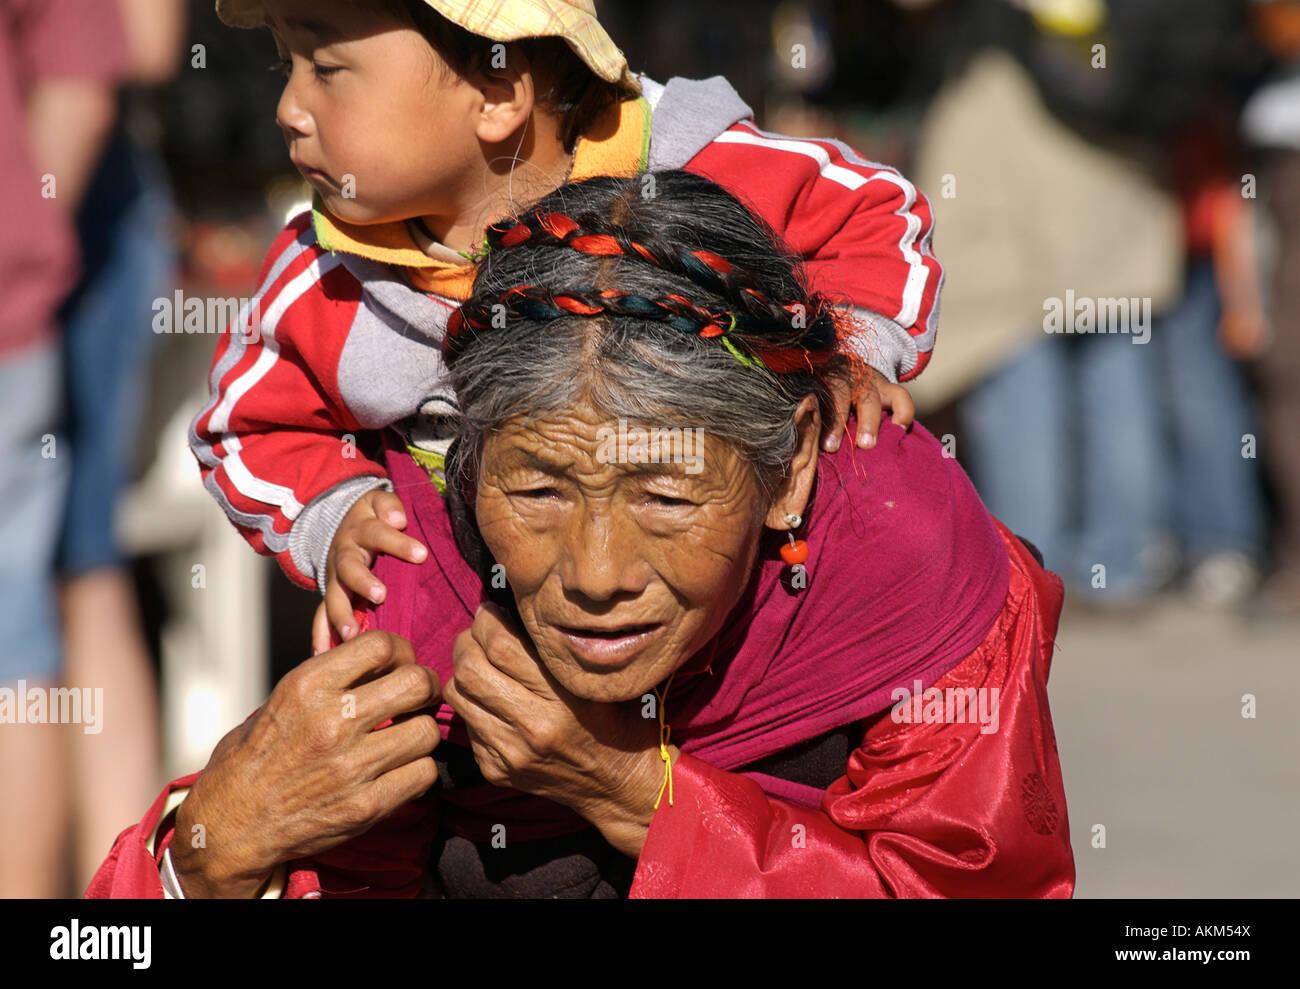 Elderly Tibetan woman carrying her grandchild on her back Lhasa Tibet - Stock Image